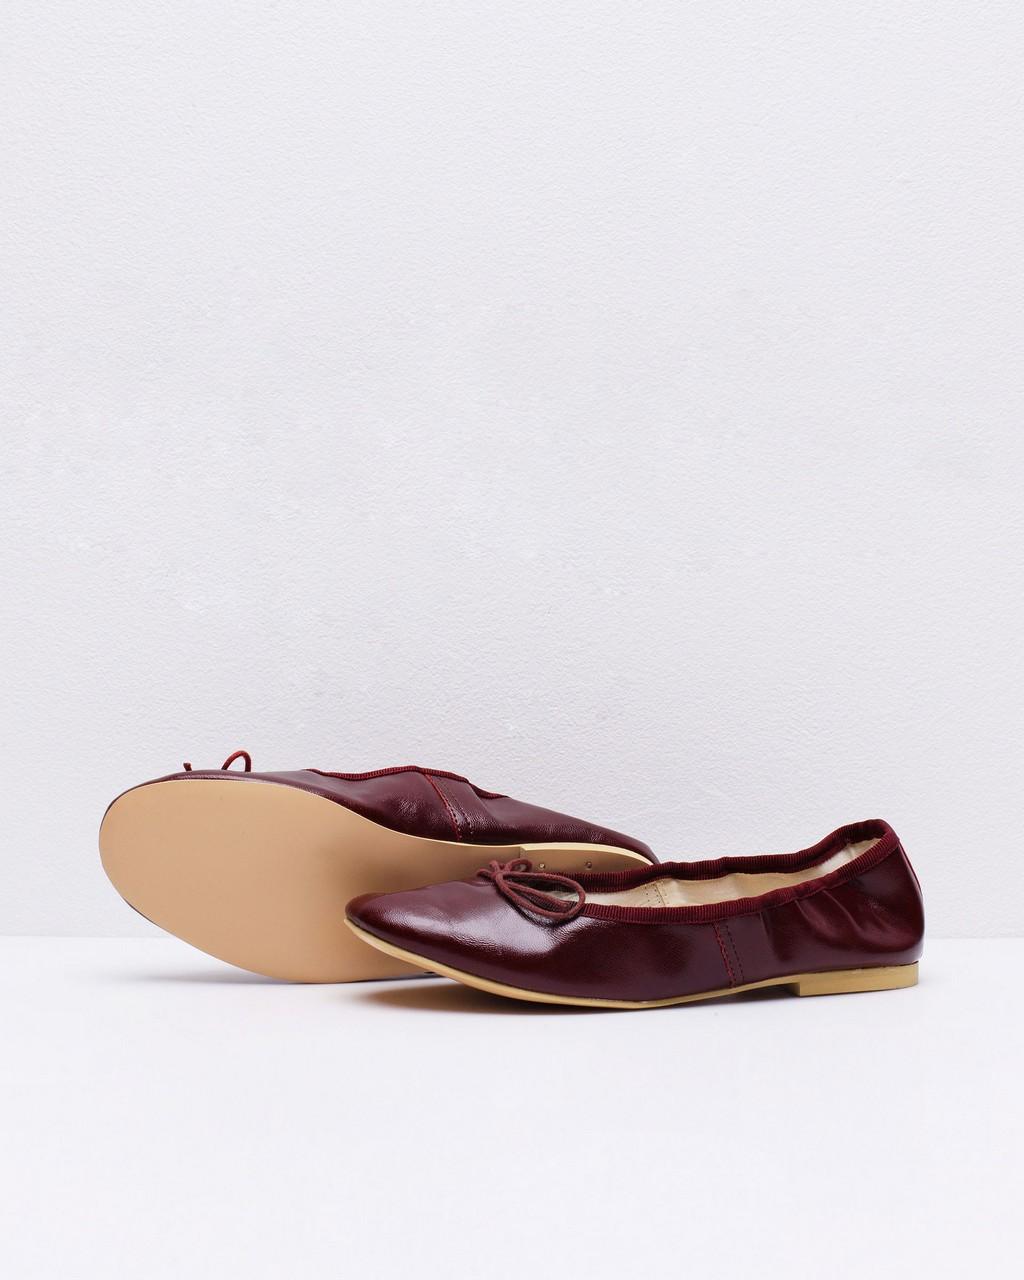 Tagtraume E.Ballerina - Burgundy(버건디)